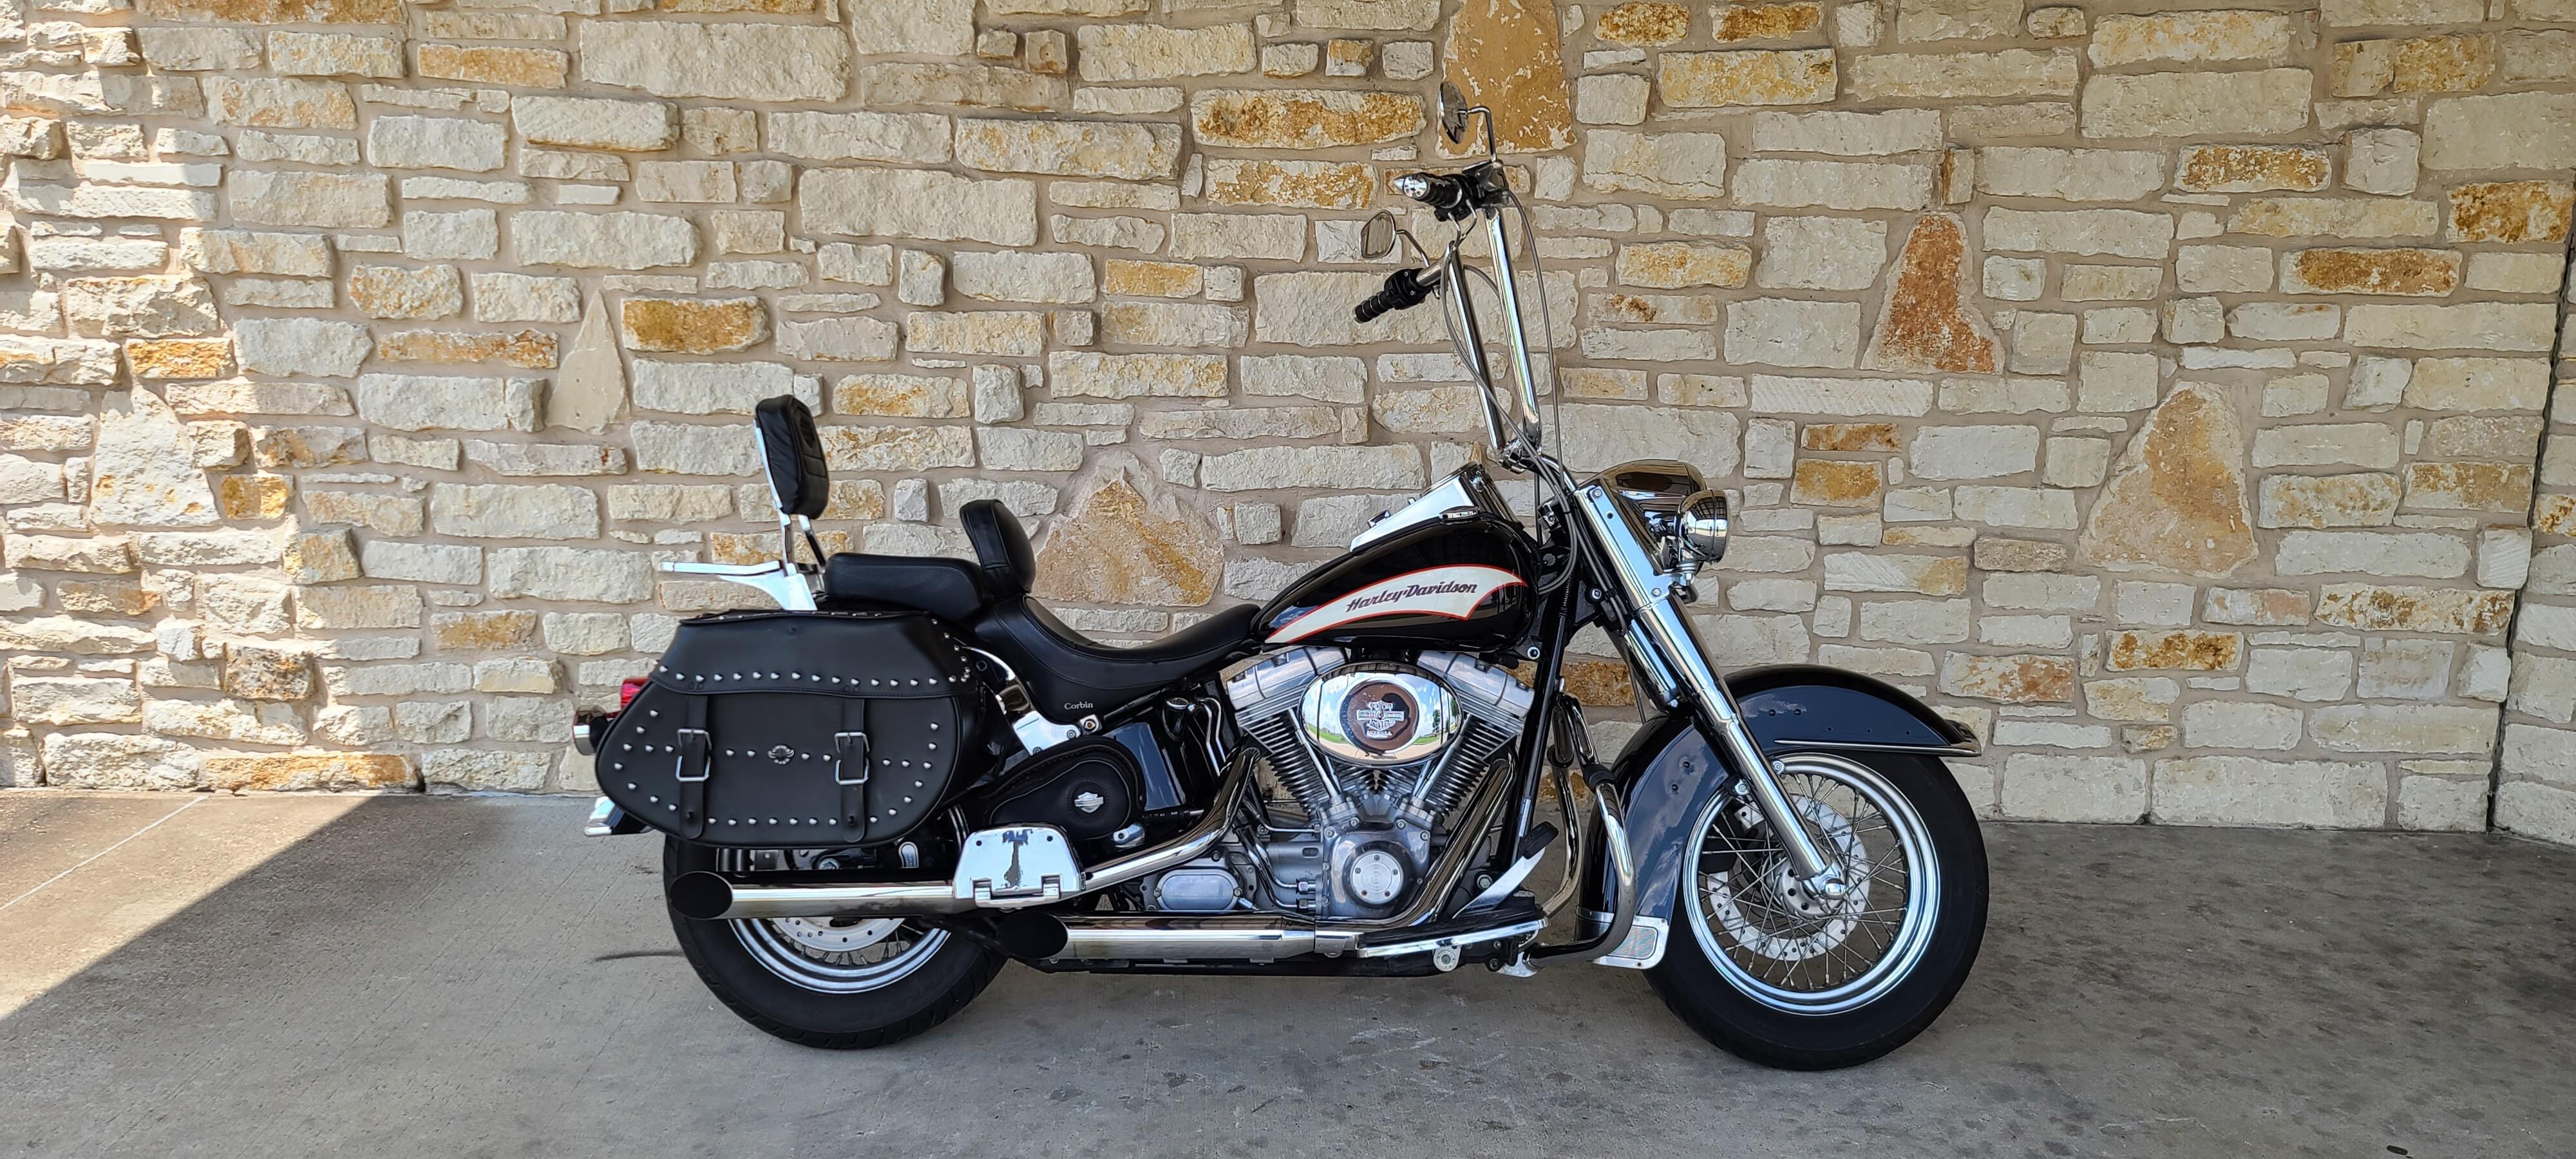 2006 Harley-Davidson Softail Heritage at Harley-Davidson of Waco